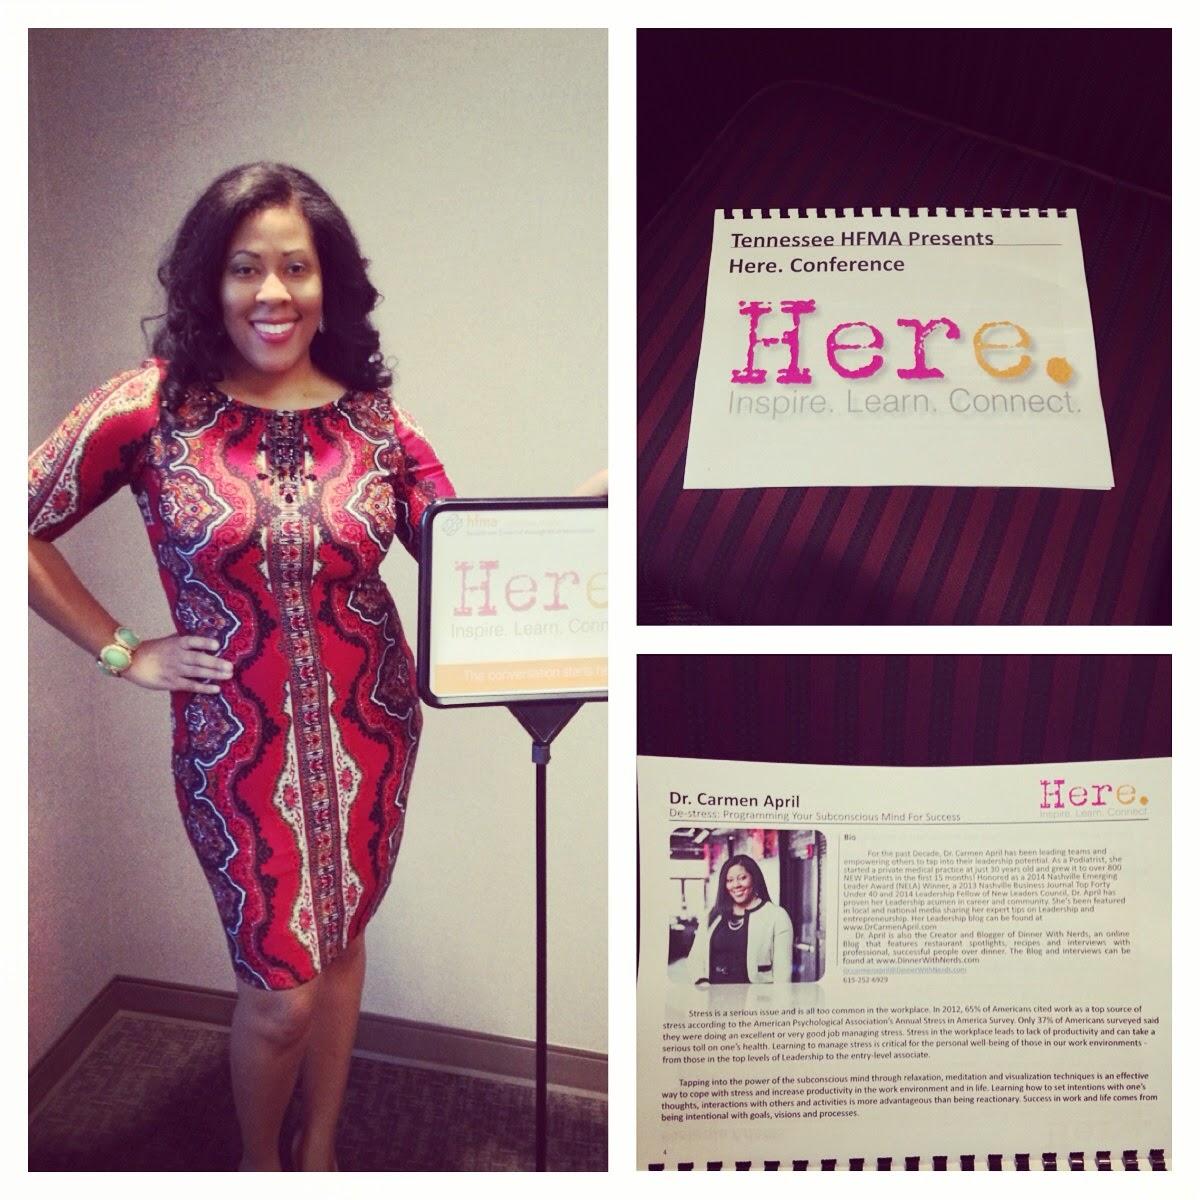 Dr. Carmen April Leadership Speaker